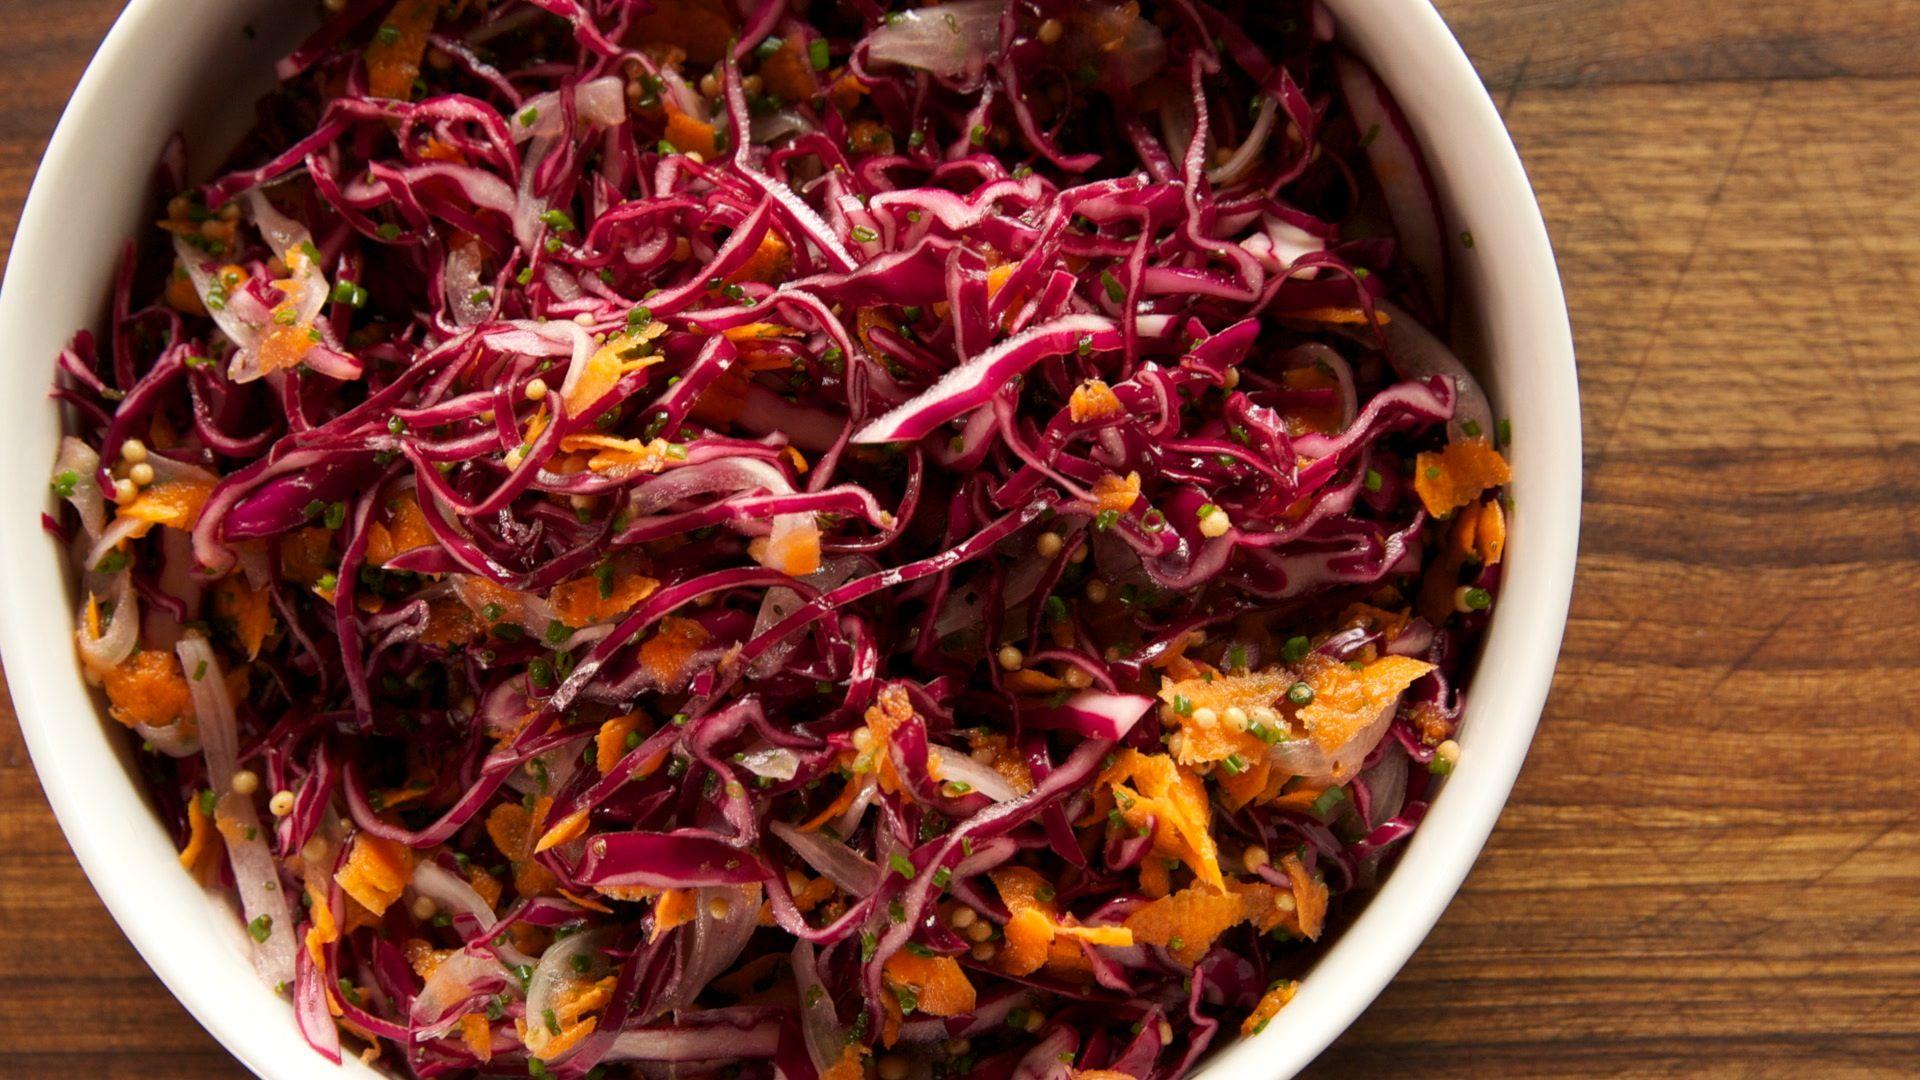 Red Coleslaw Recipe Coleslaw Red Cabbage Coleslaw Smoked Brisket